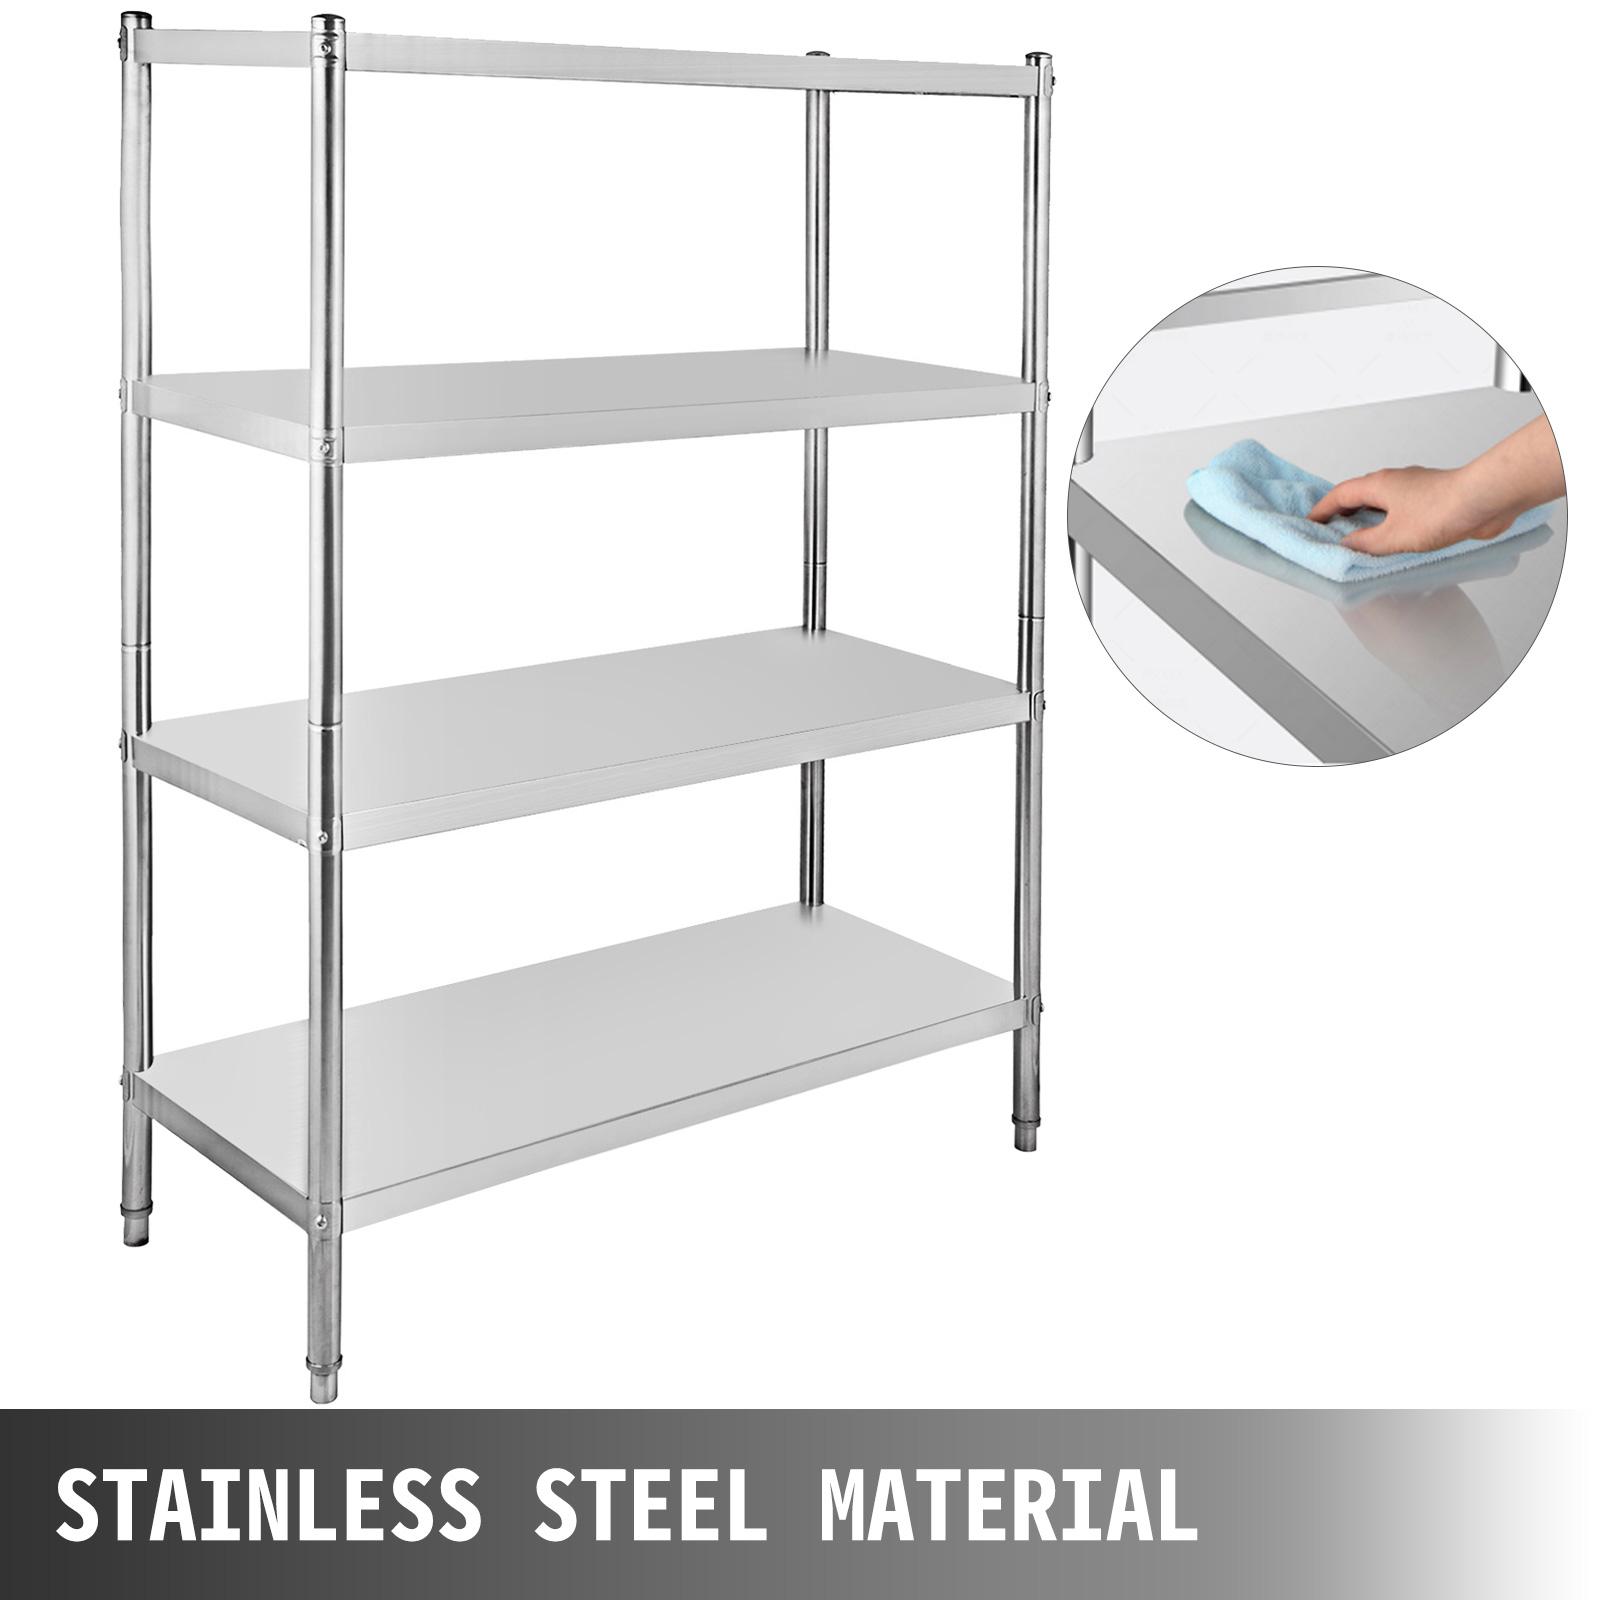 4-5 Tier Stainless Steel Shelf Stand Commercial Kitchen Restaurant Shelving Rack